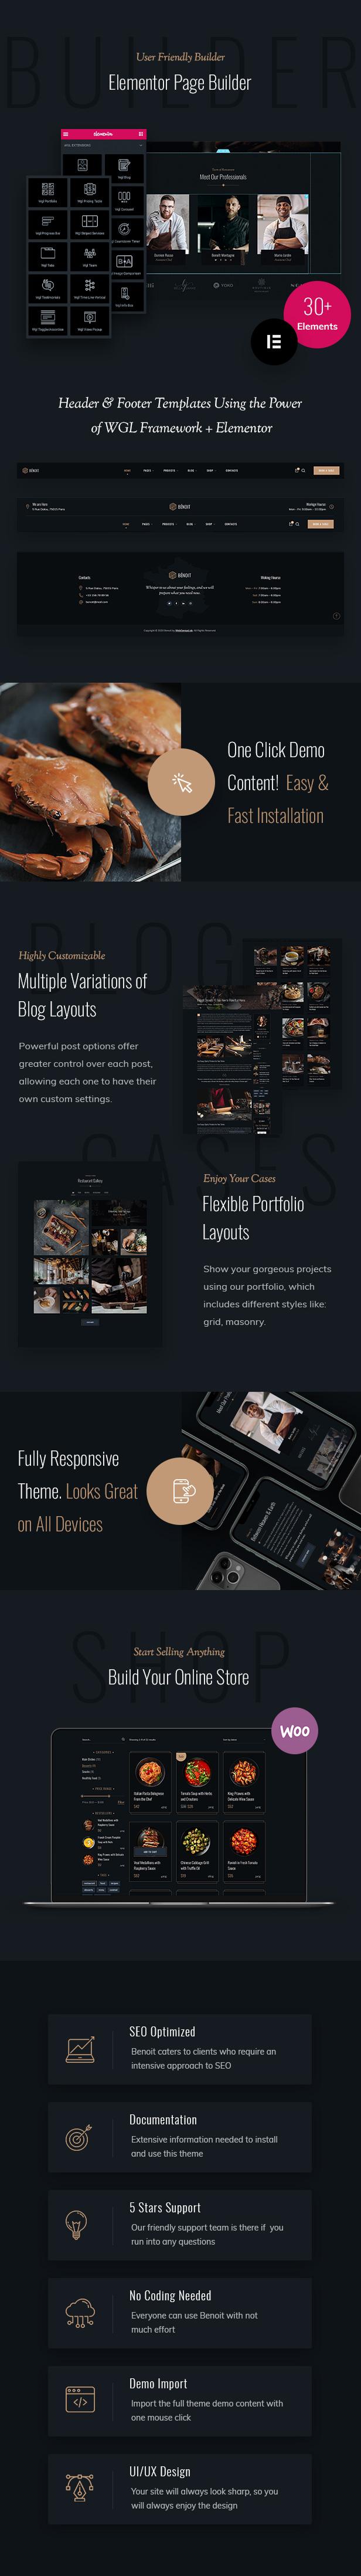 Benoit - Restaurants & Cafes WordPress Theme - 3